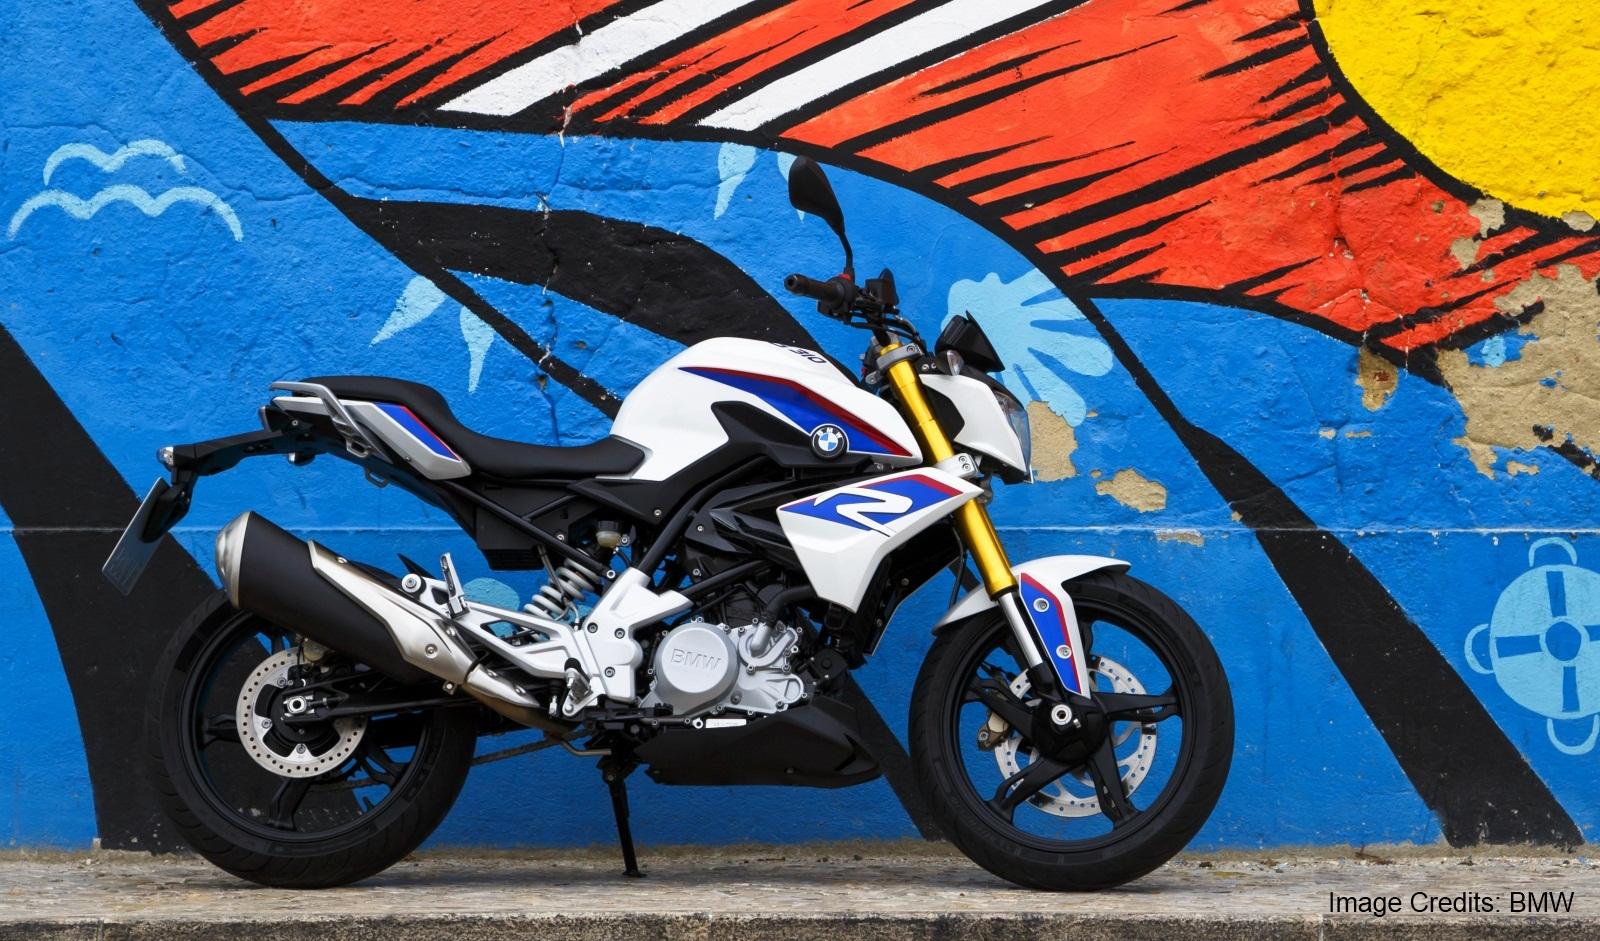 Bardzo dobra HD Best wallpaper: BMW G 310 R Bike HD NEW wallpaper download YD51